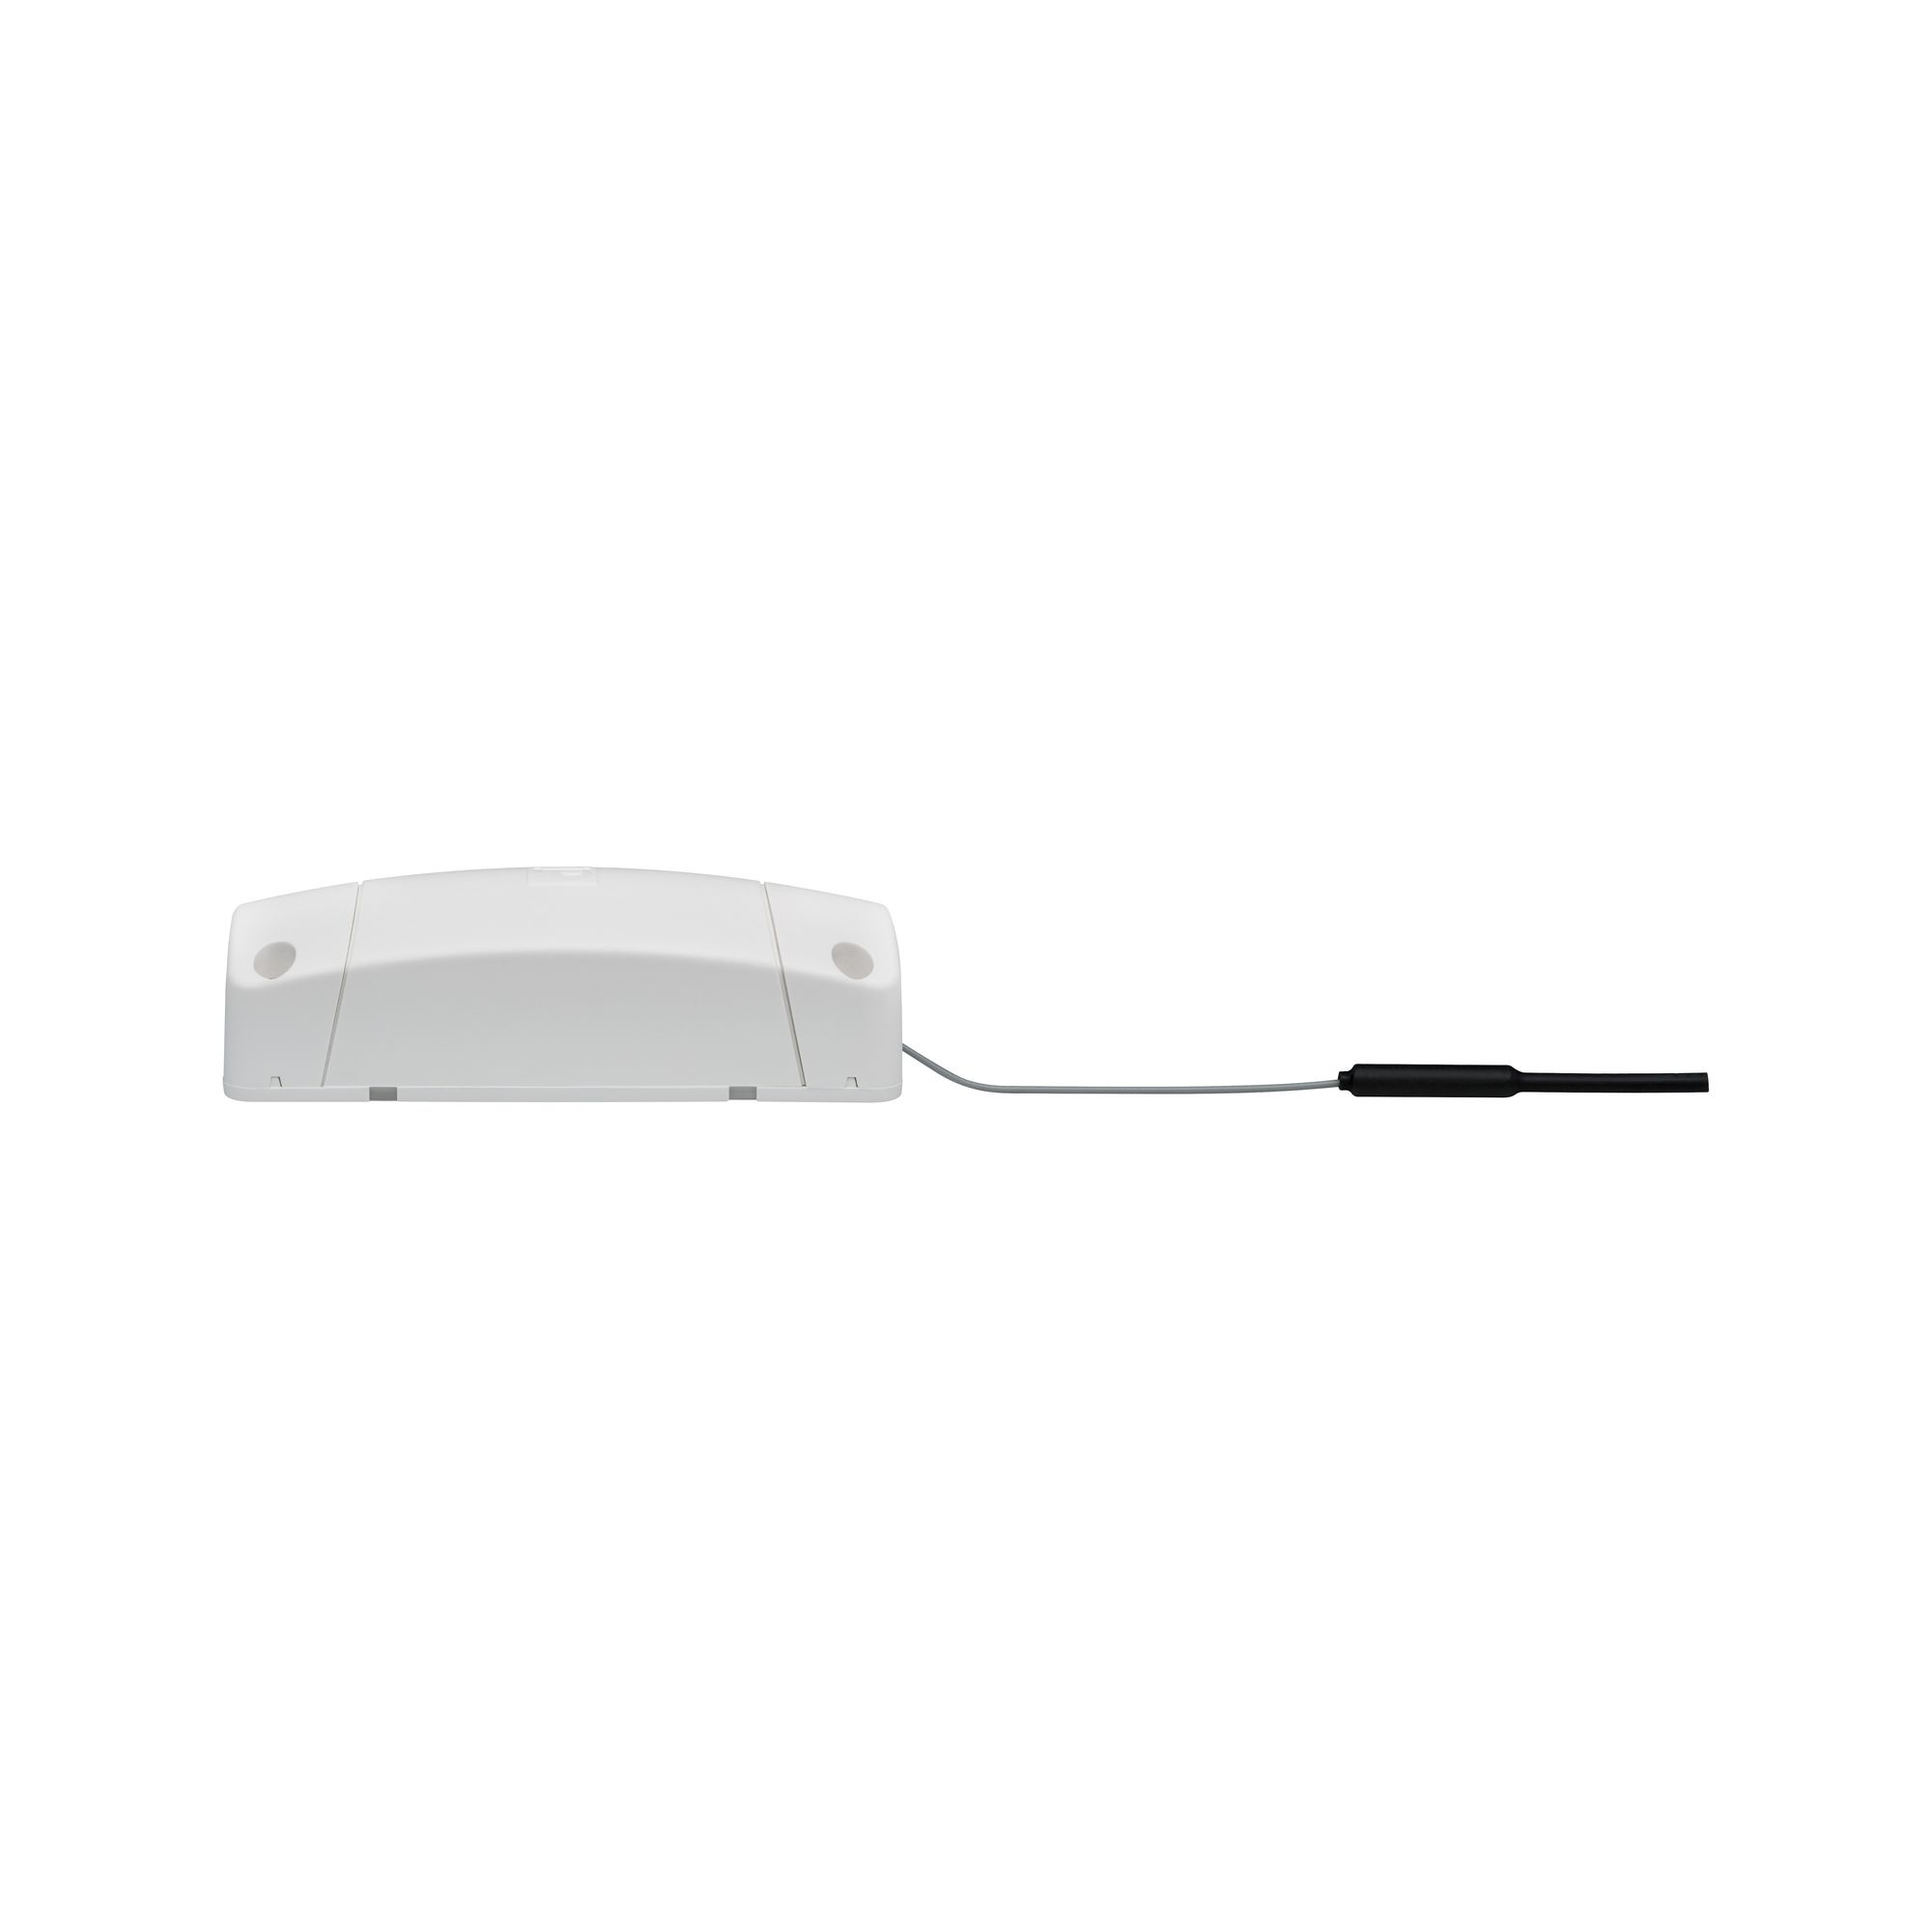 Paulmann SmartHome ZB Cephei Schalt Controllermax. 1000W 230V AC Weiß/Grau Kunststoff